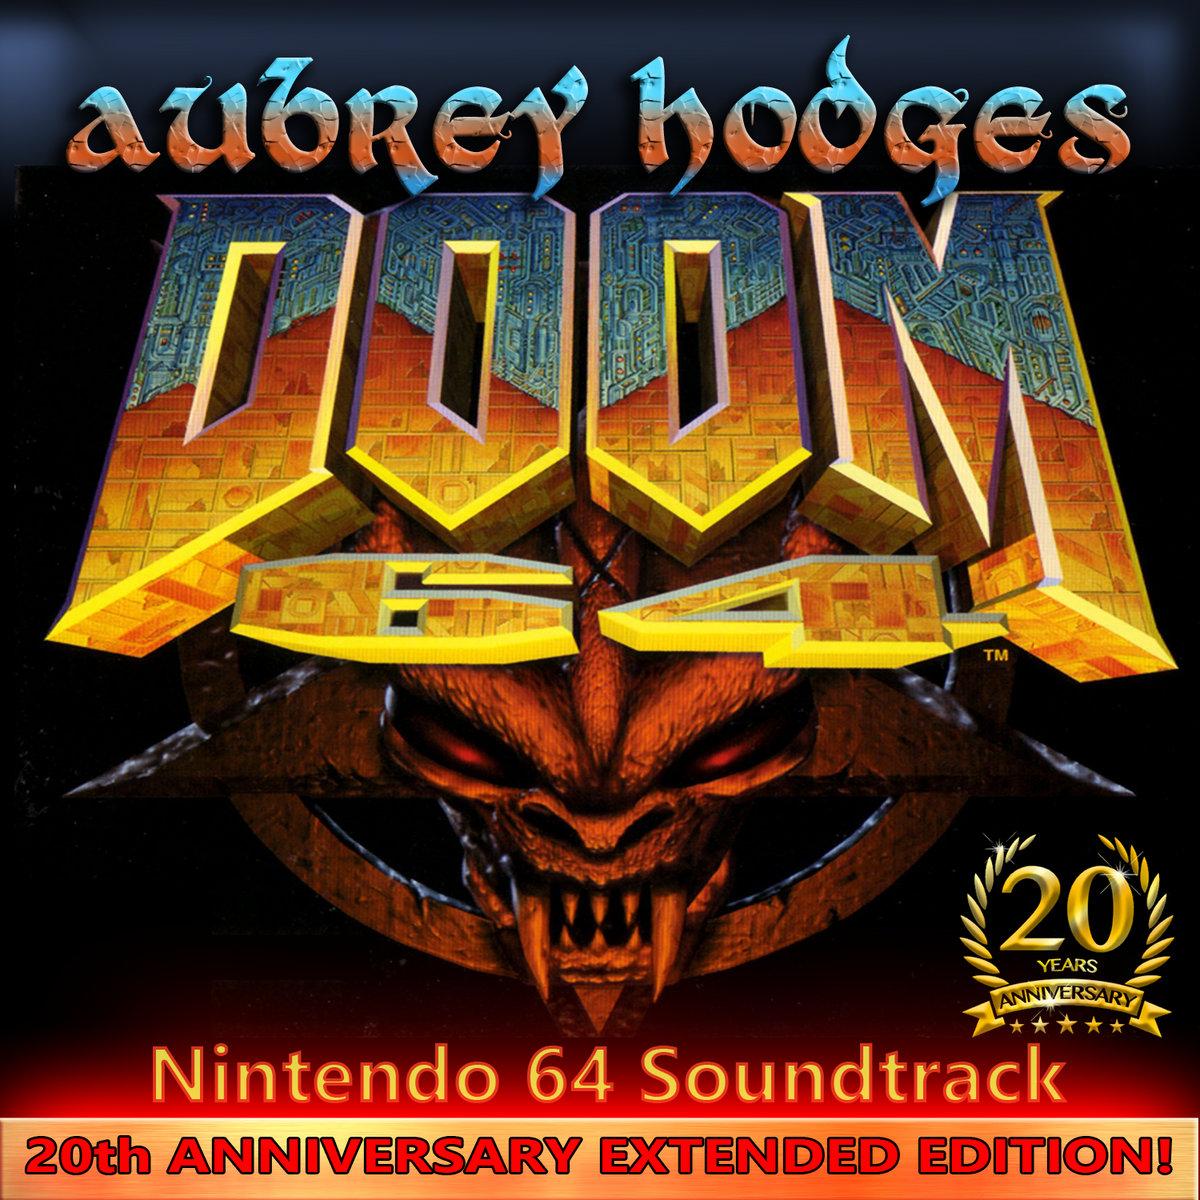 Doom Playstation: Official Soundtrack | Aubrey Hodges